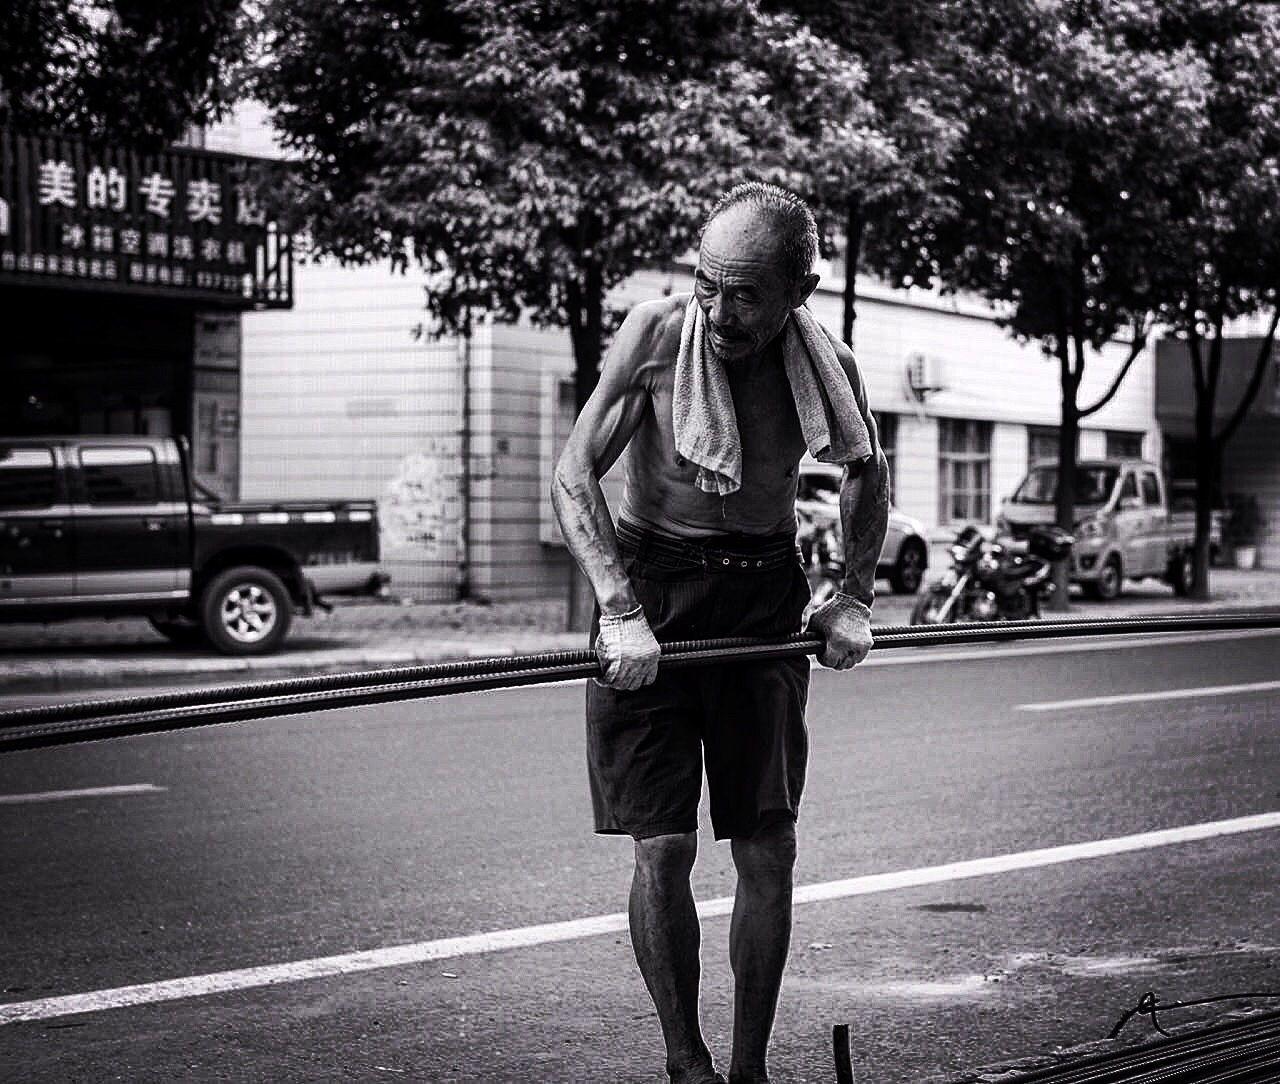 summer Blackandwhite Leicam HuBei Streetphotography Taking Photos Capture The Moment Man Working Summer Oldman